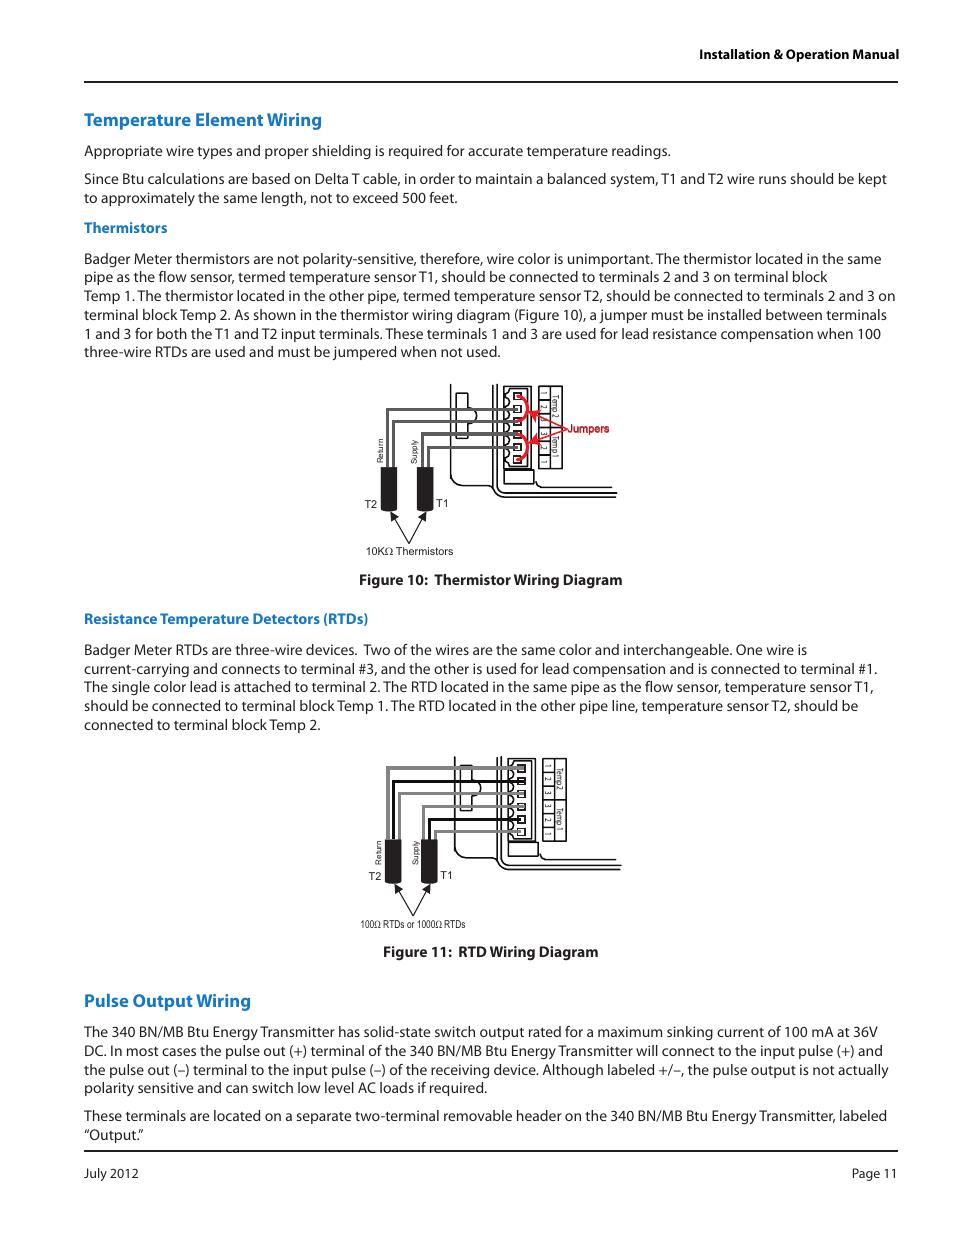 hight resolution of temperature element wiring thermistors resistance temperature detectors rtds badger meter 340